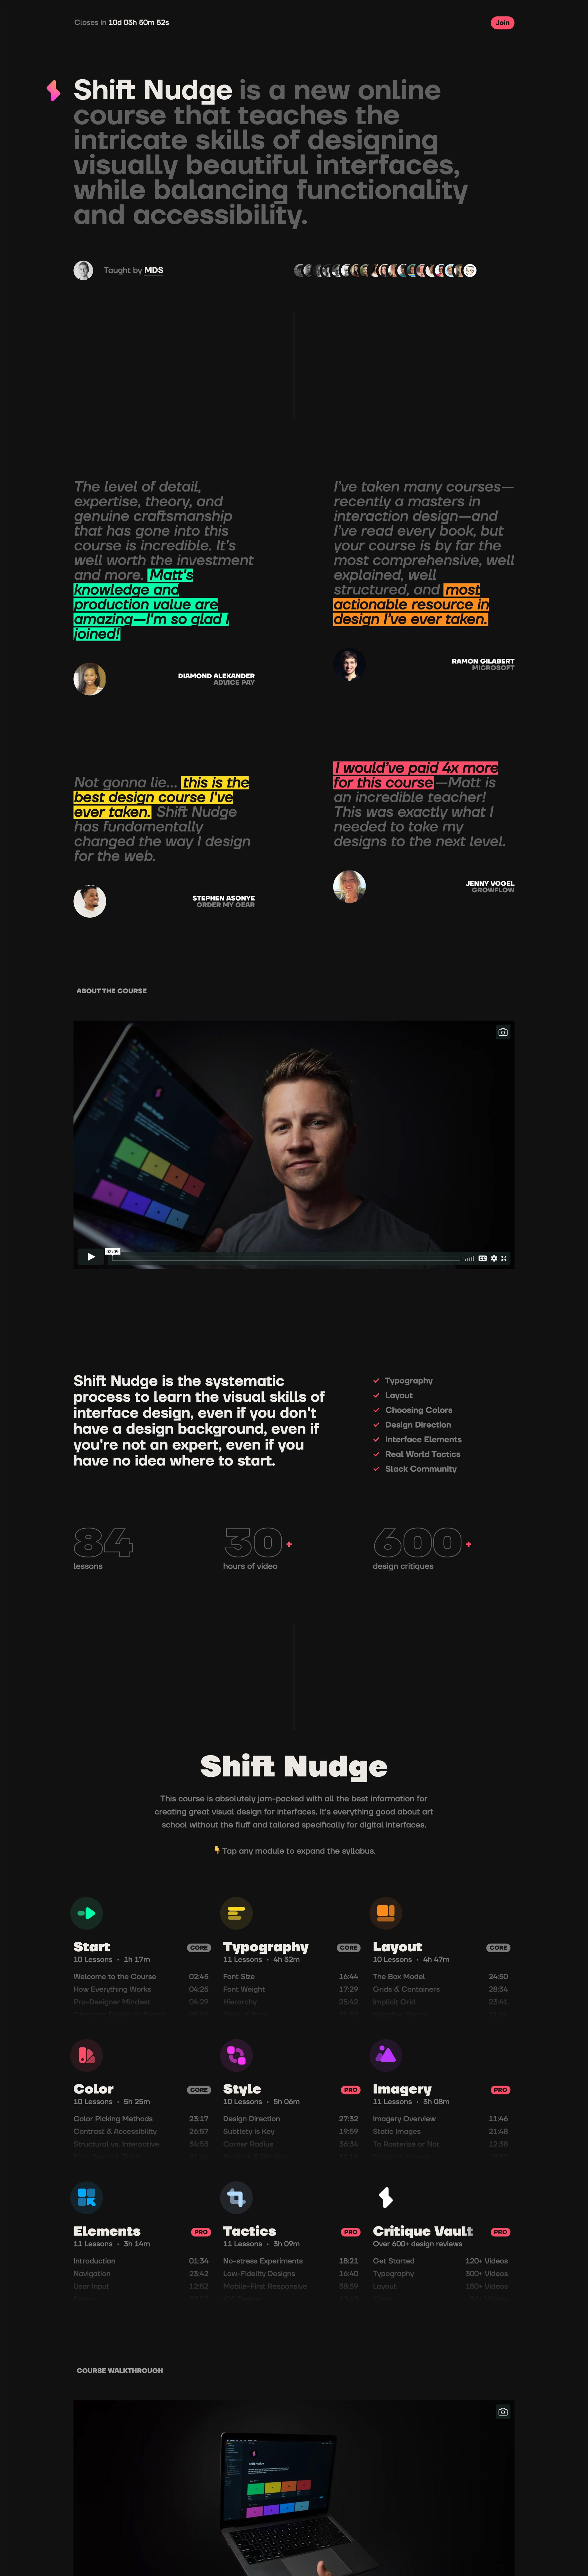 Shift Nudge Website Screenshot